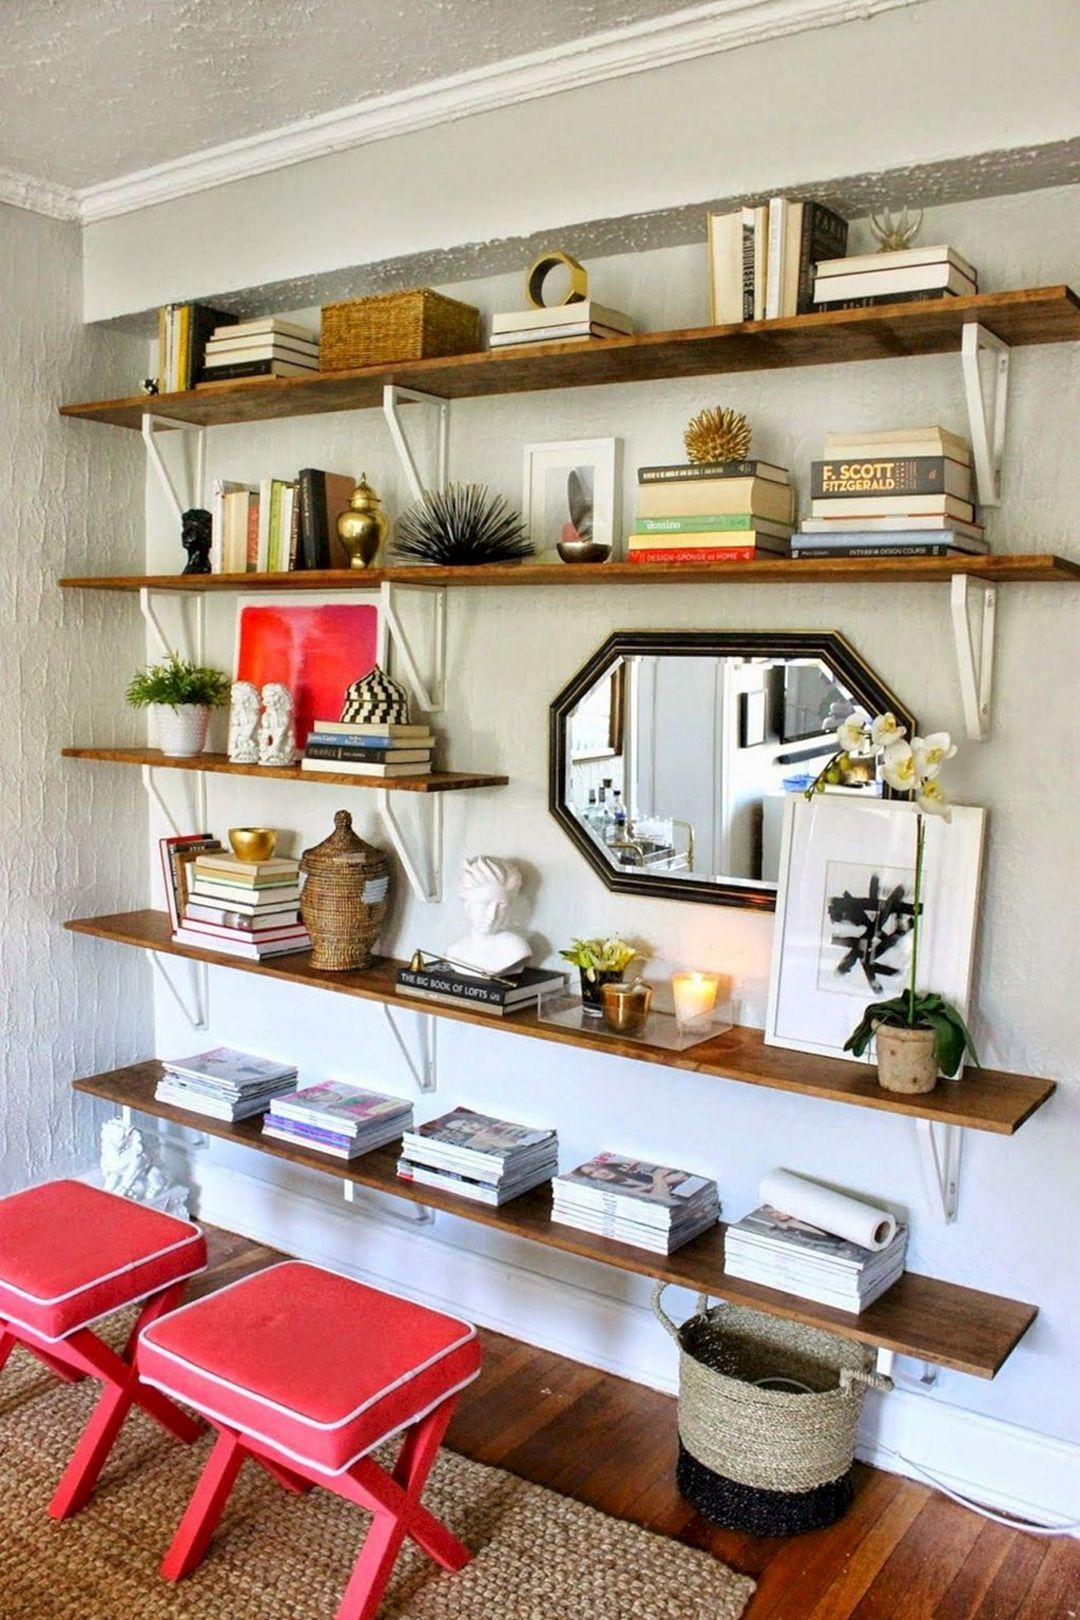 15 Most Popular Living Room Open Shelving Ideas For Inspiration